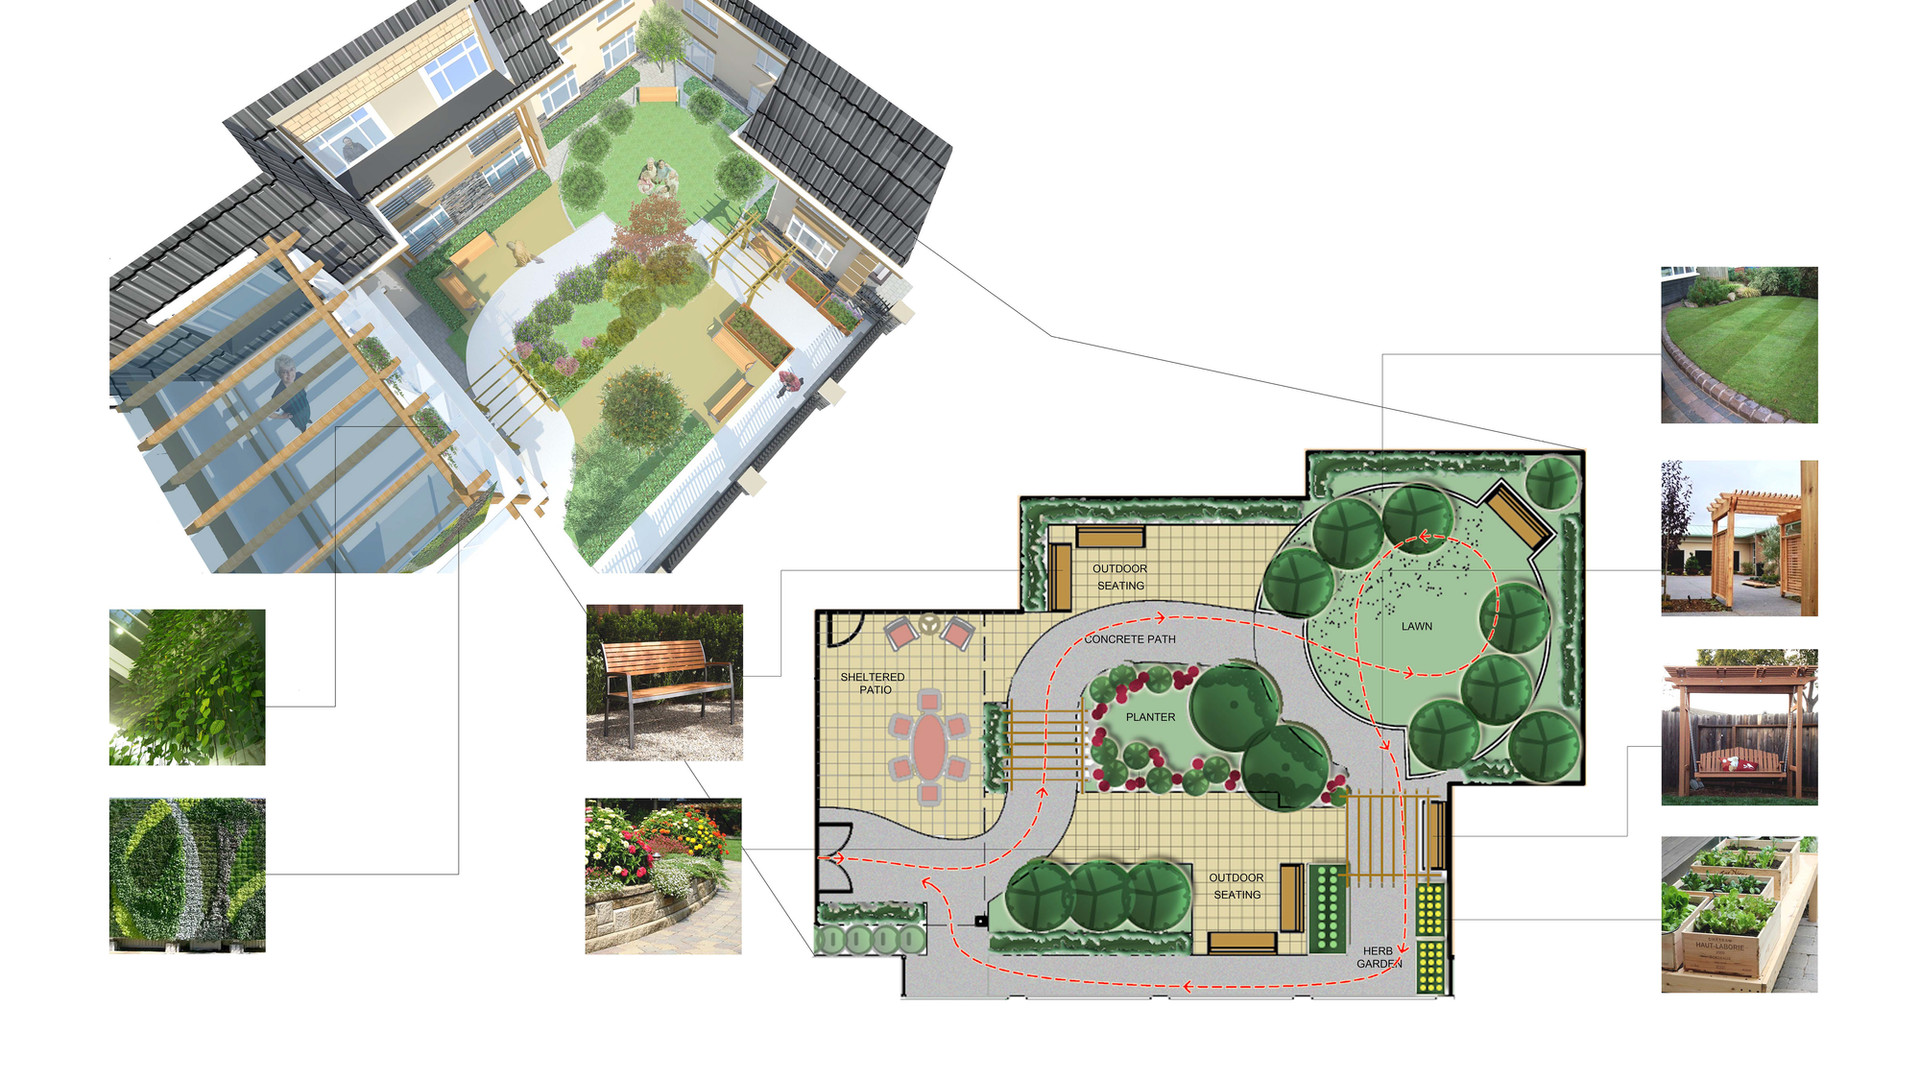 Cresent Garden Front Facade Planning